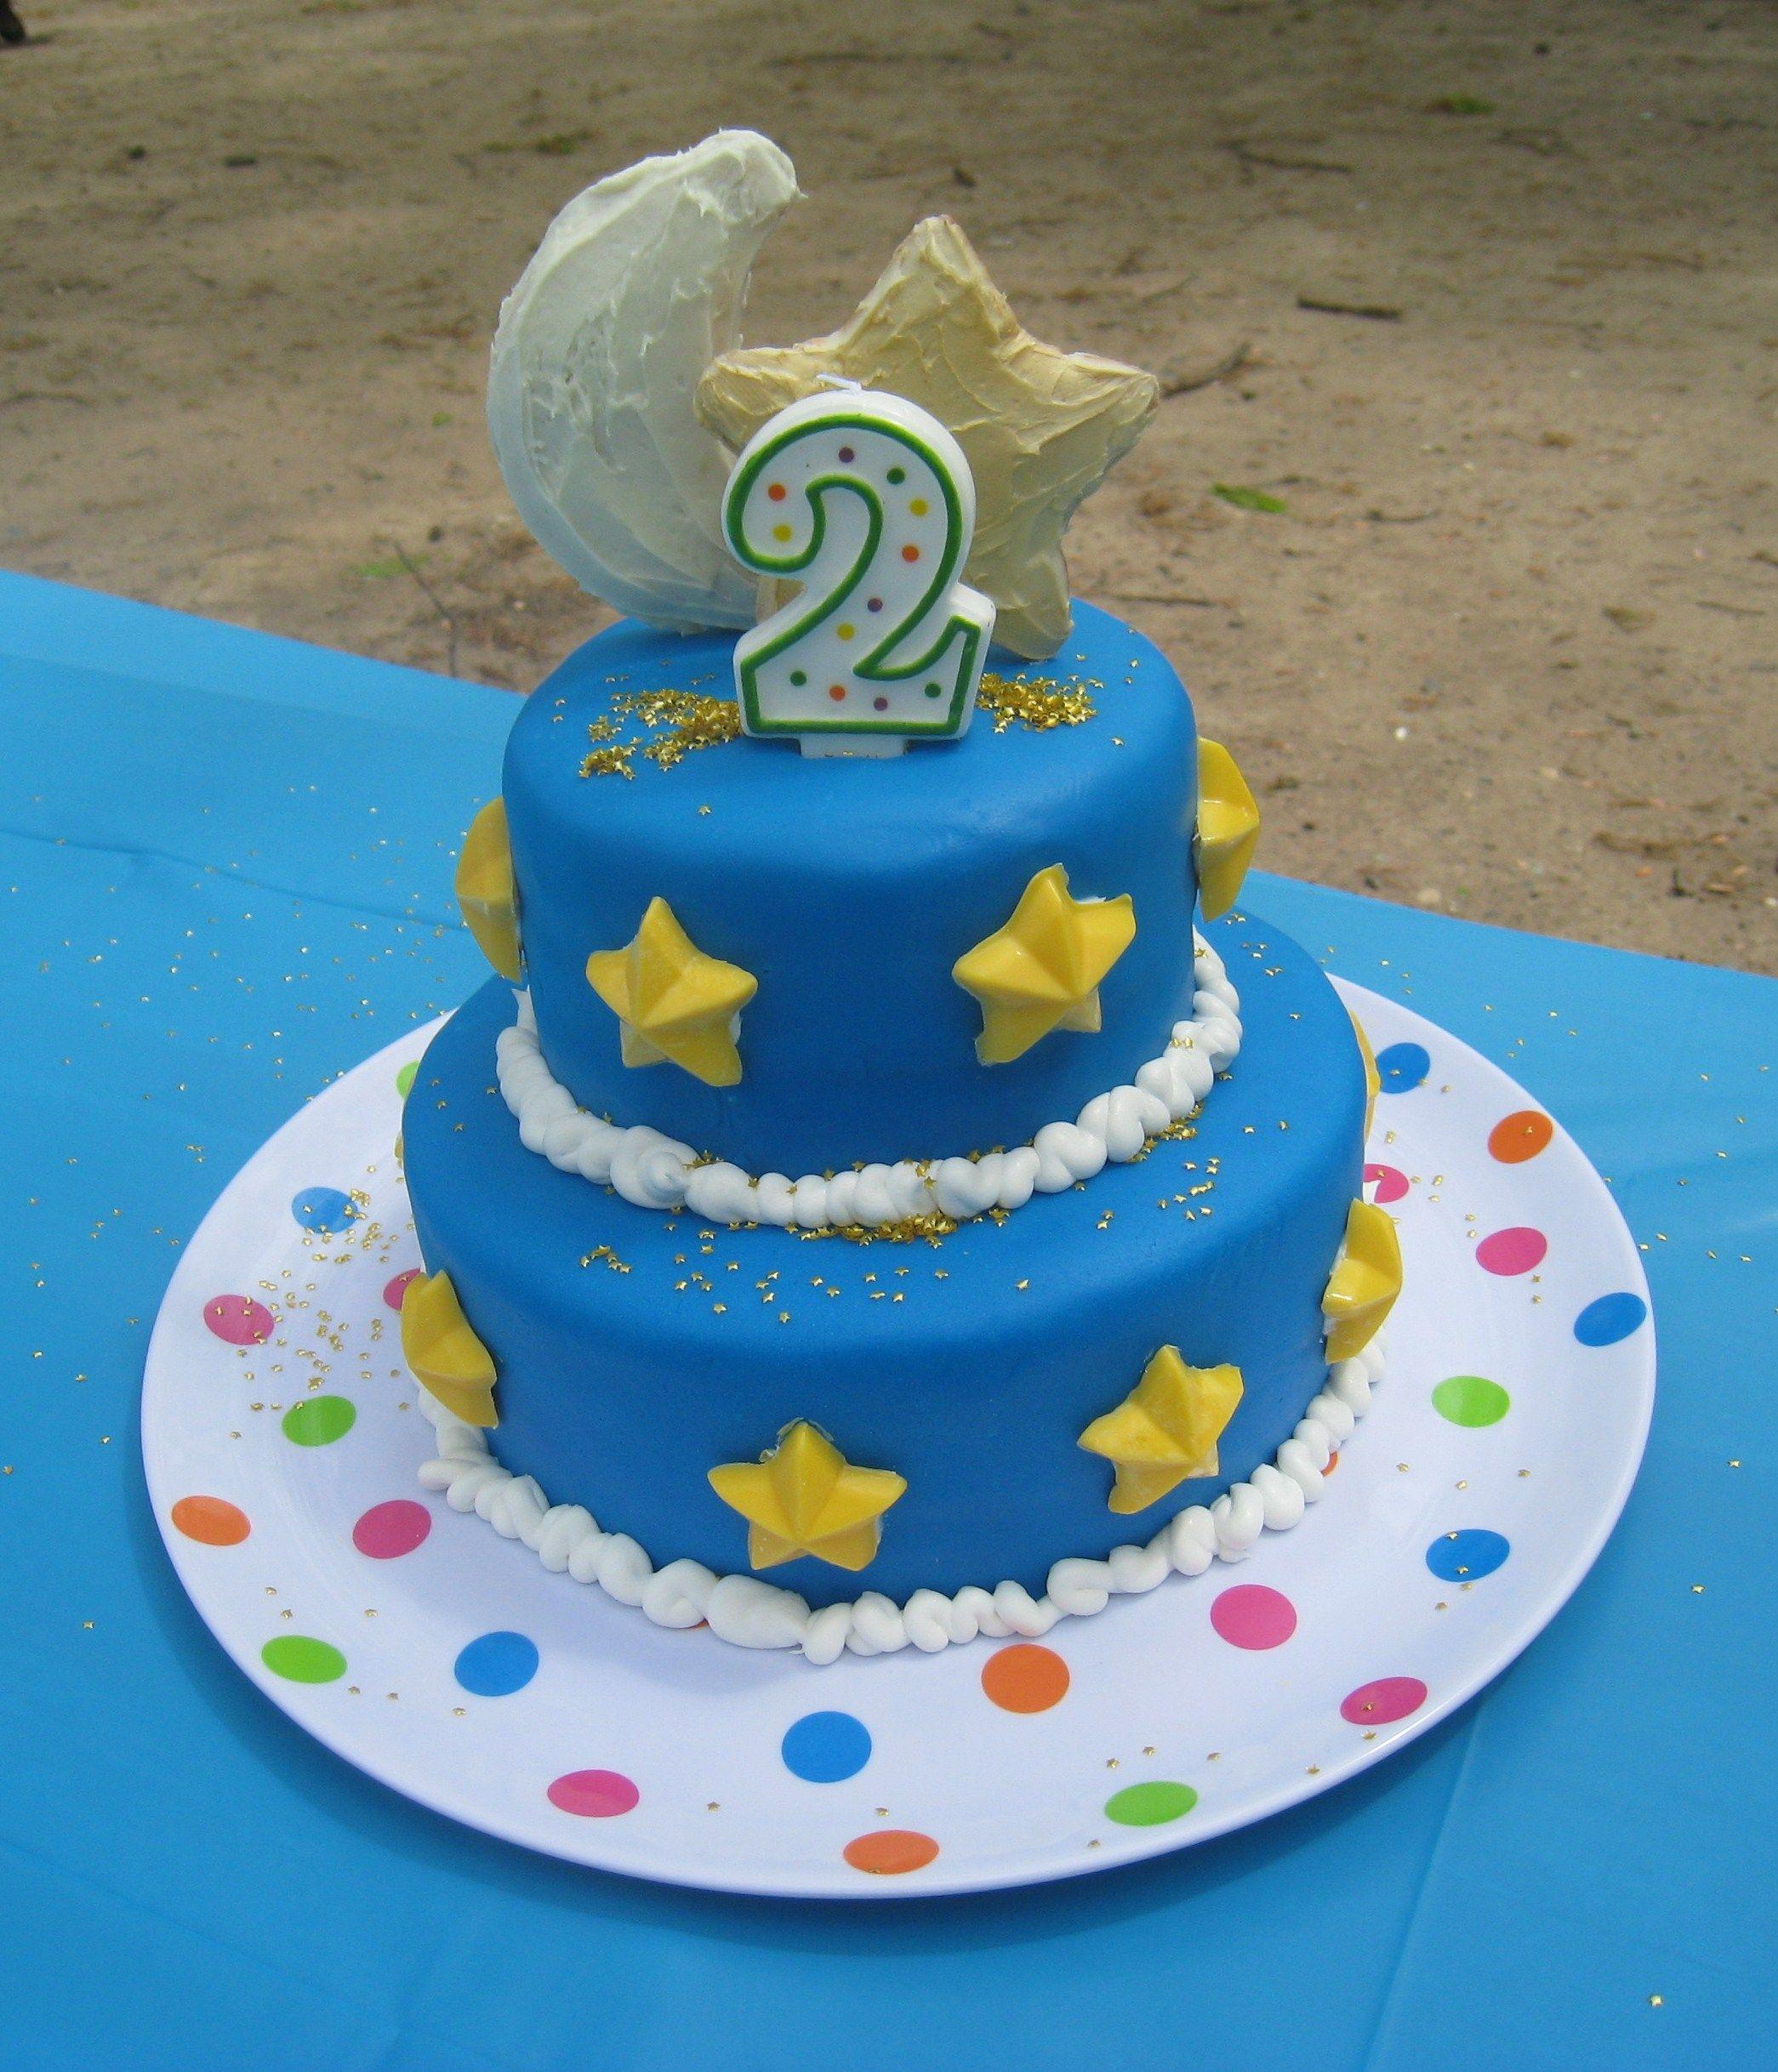 Birthday Cake Cake Ideas Birthday And Otherwise Pinterest - 2nd birthday cake designs